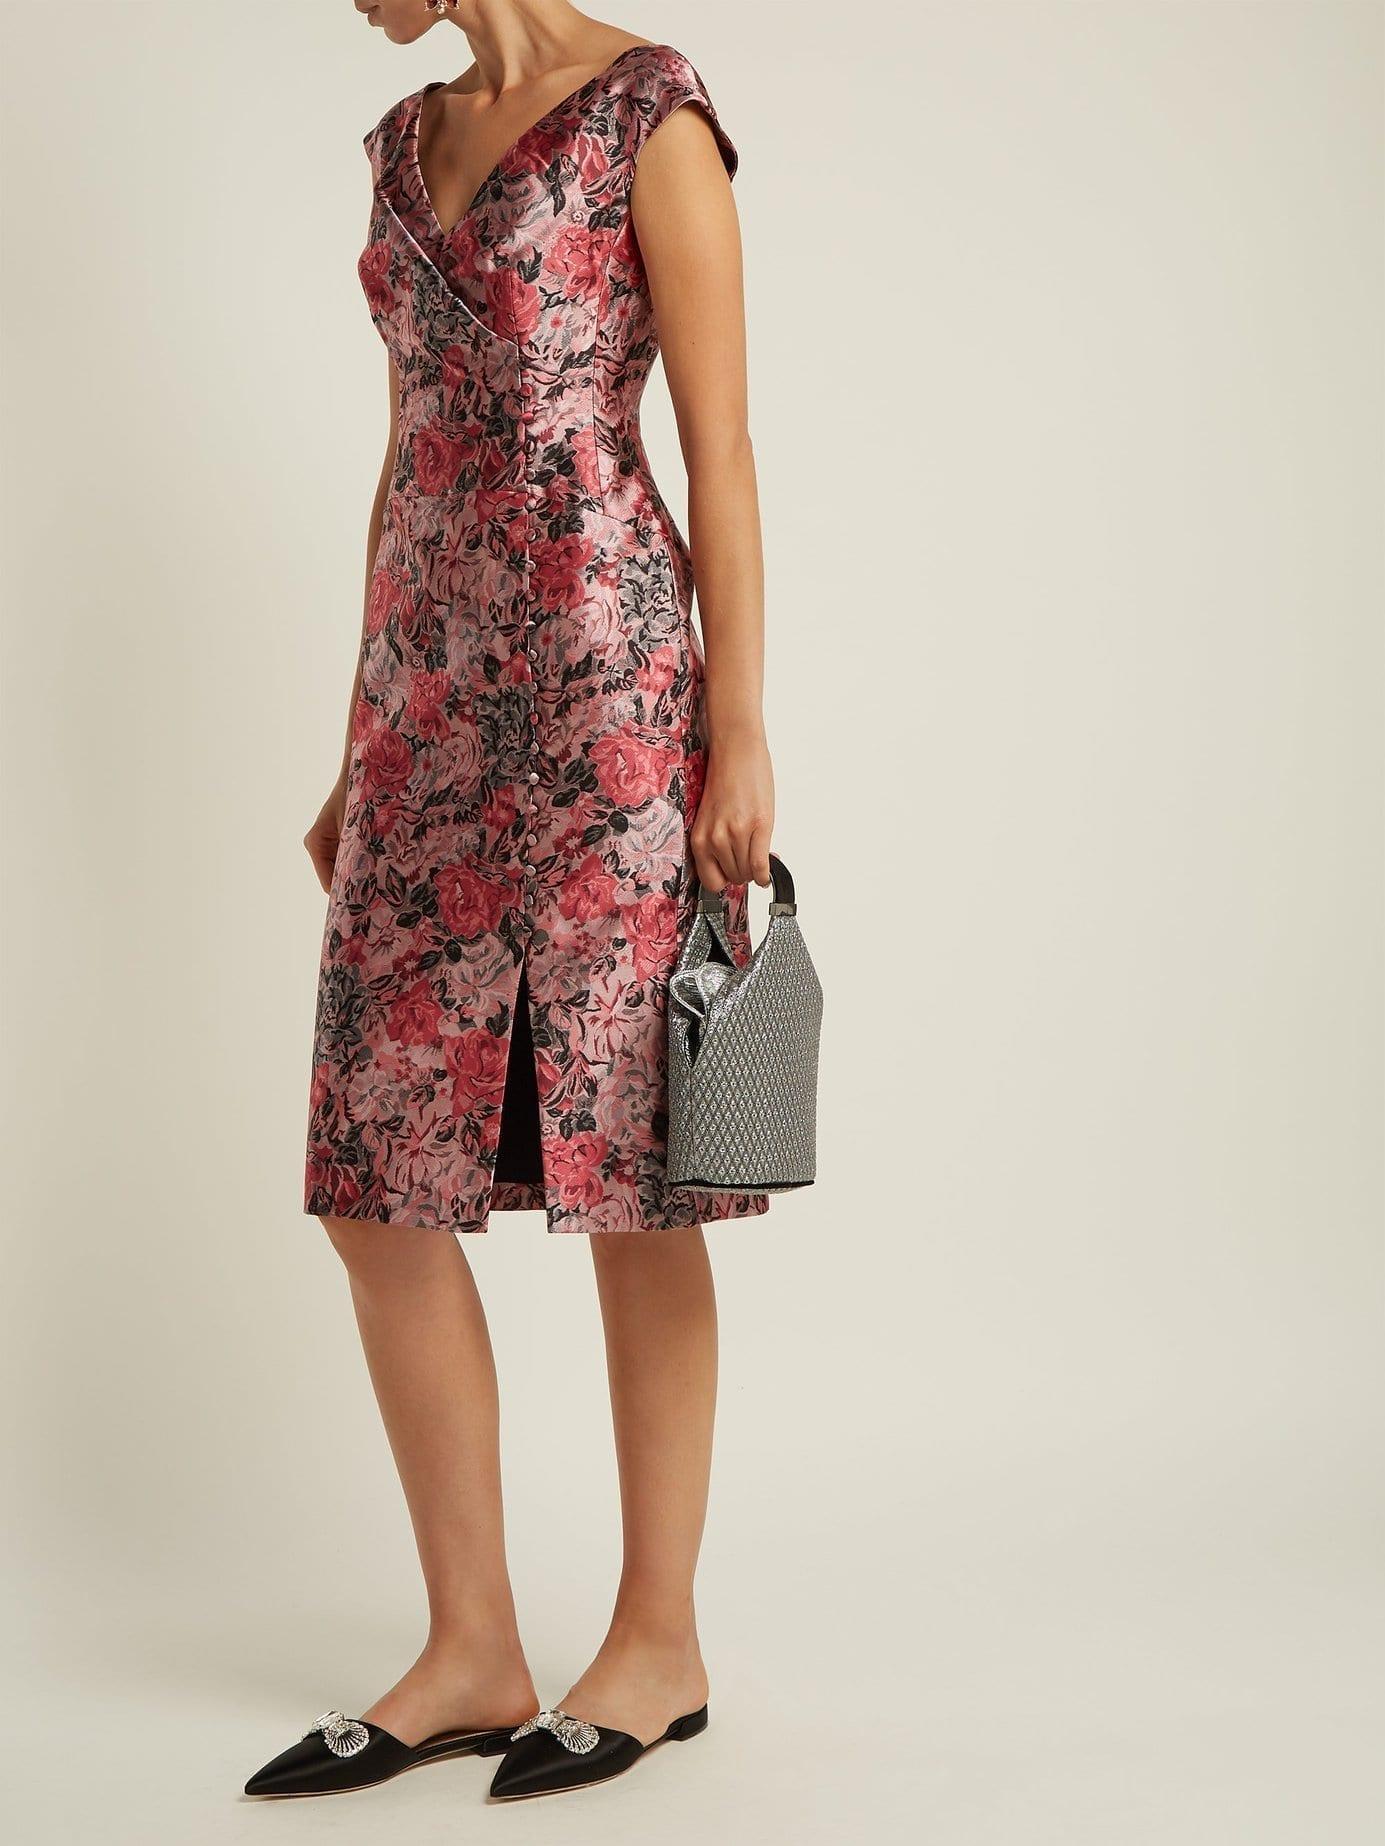 ERDEM Joyti Floral Jacquard Pink Dress